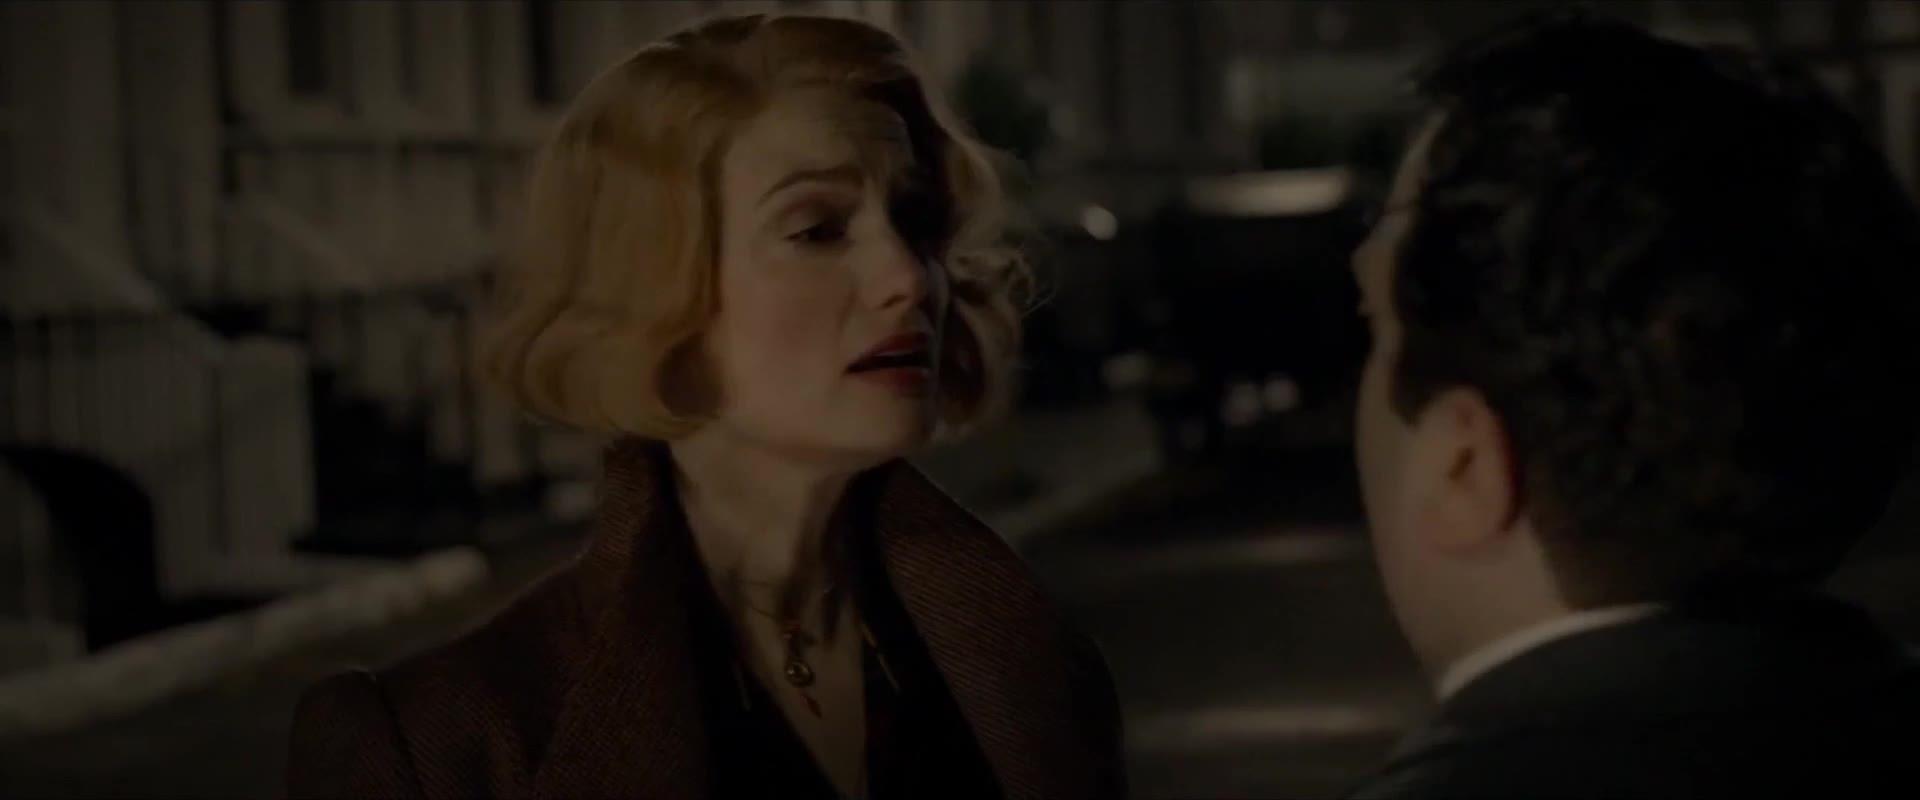 Fantastic.Beasts.The.Crimes.of.Grindelwald.2018.1080p.HC.HDRip تحميل تورنت فيلم 3 arabp2p.com